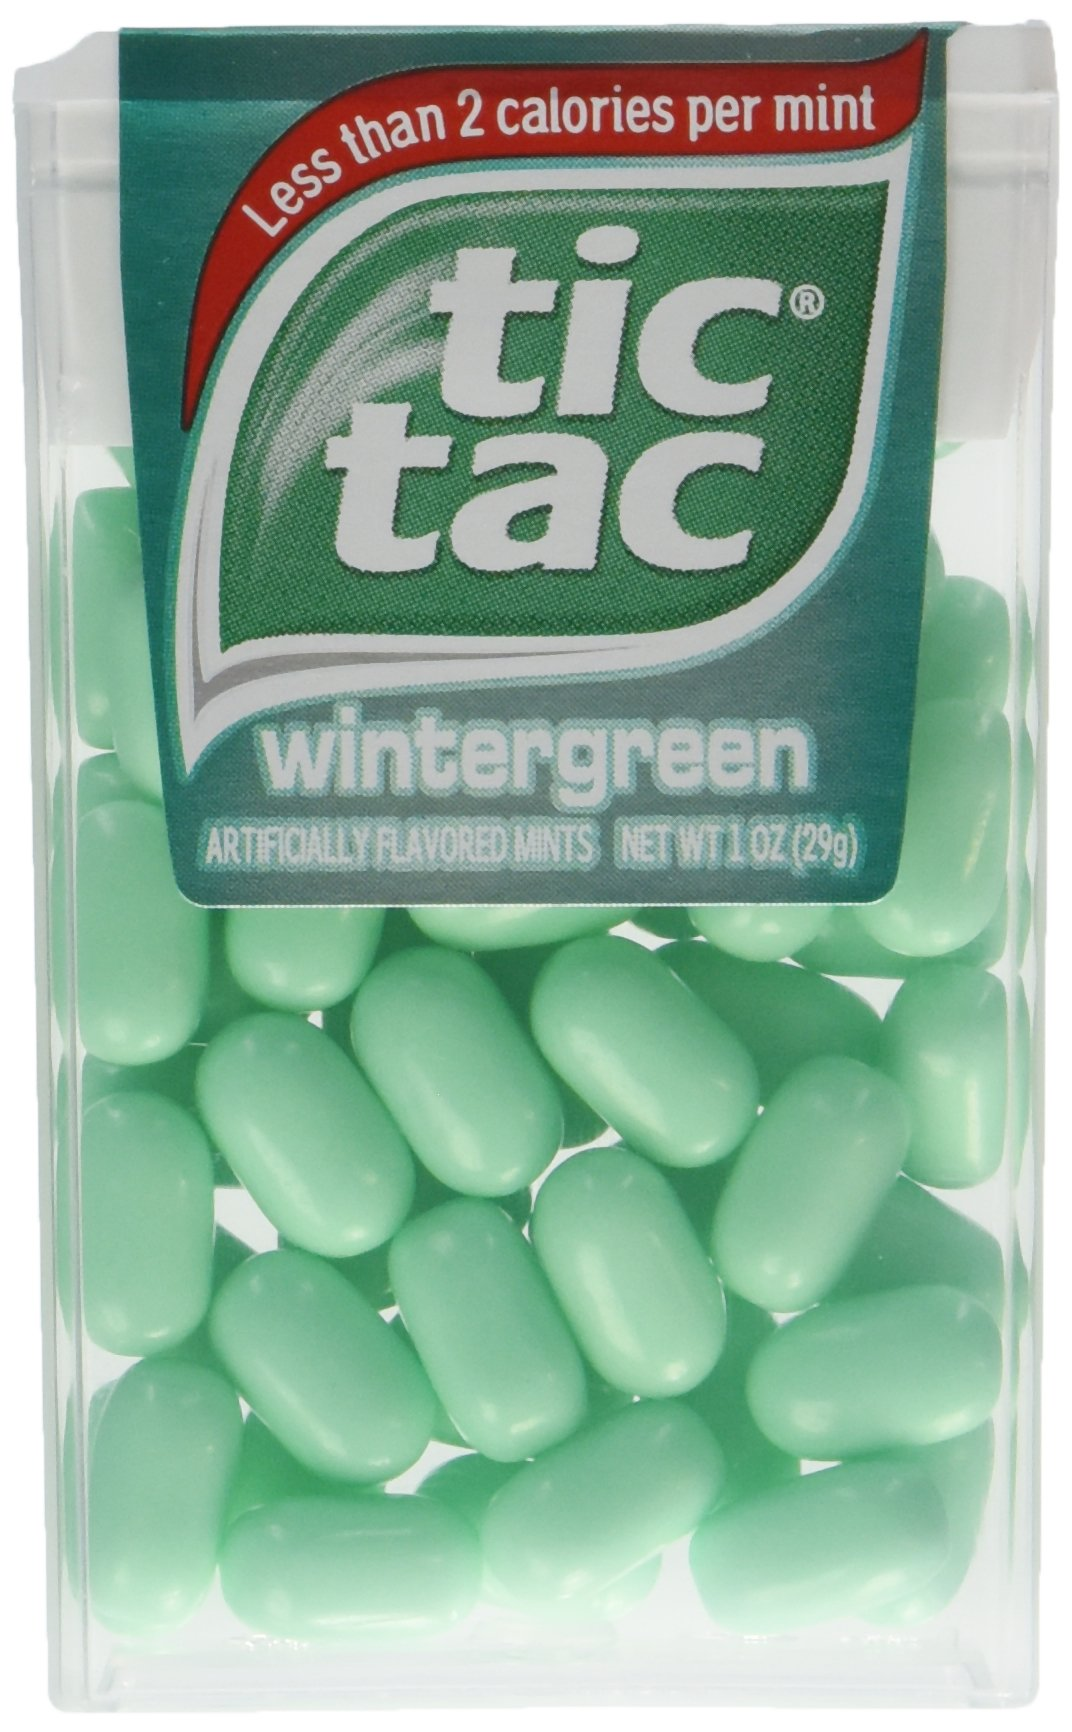 Tic Tac Mint, Wintergreen, Fresh Breath Mints, 24 Count by Tic Tac